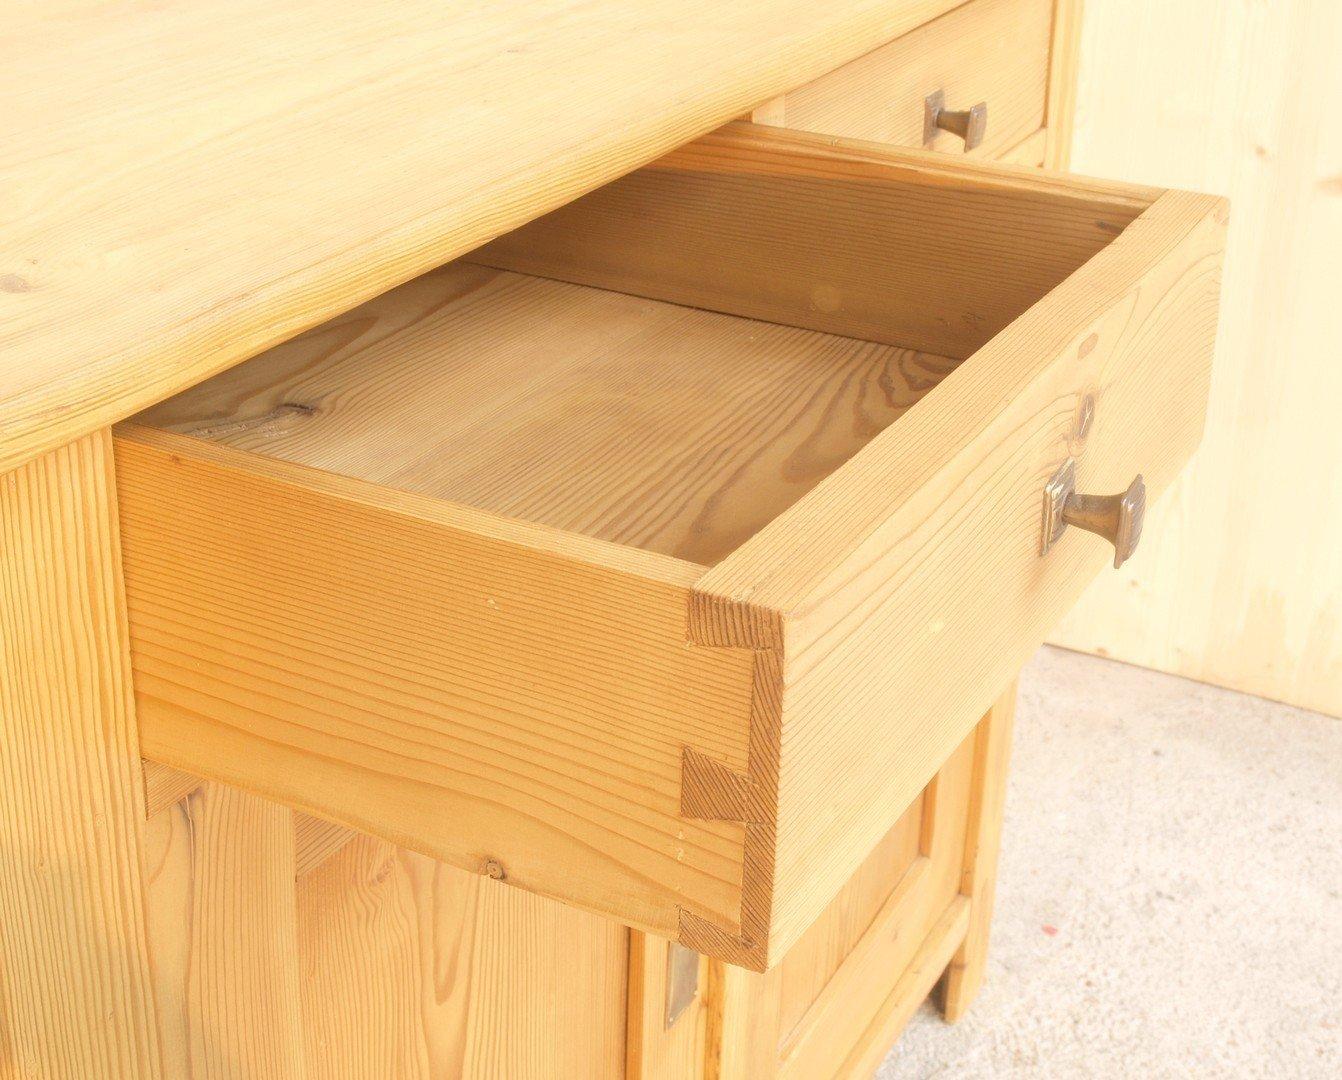 Alte antike anrichte kommode wickelkommode massivholz - Antike kuchenmobel ...